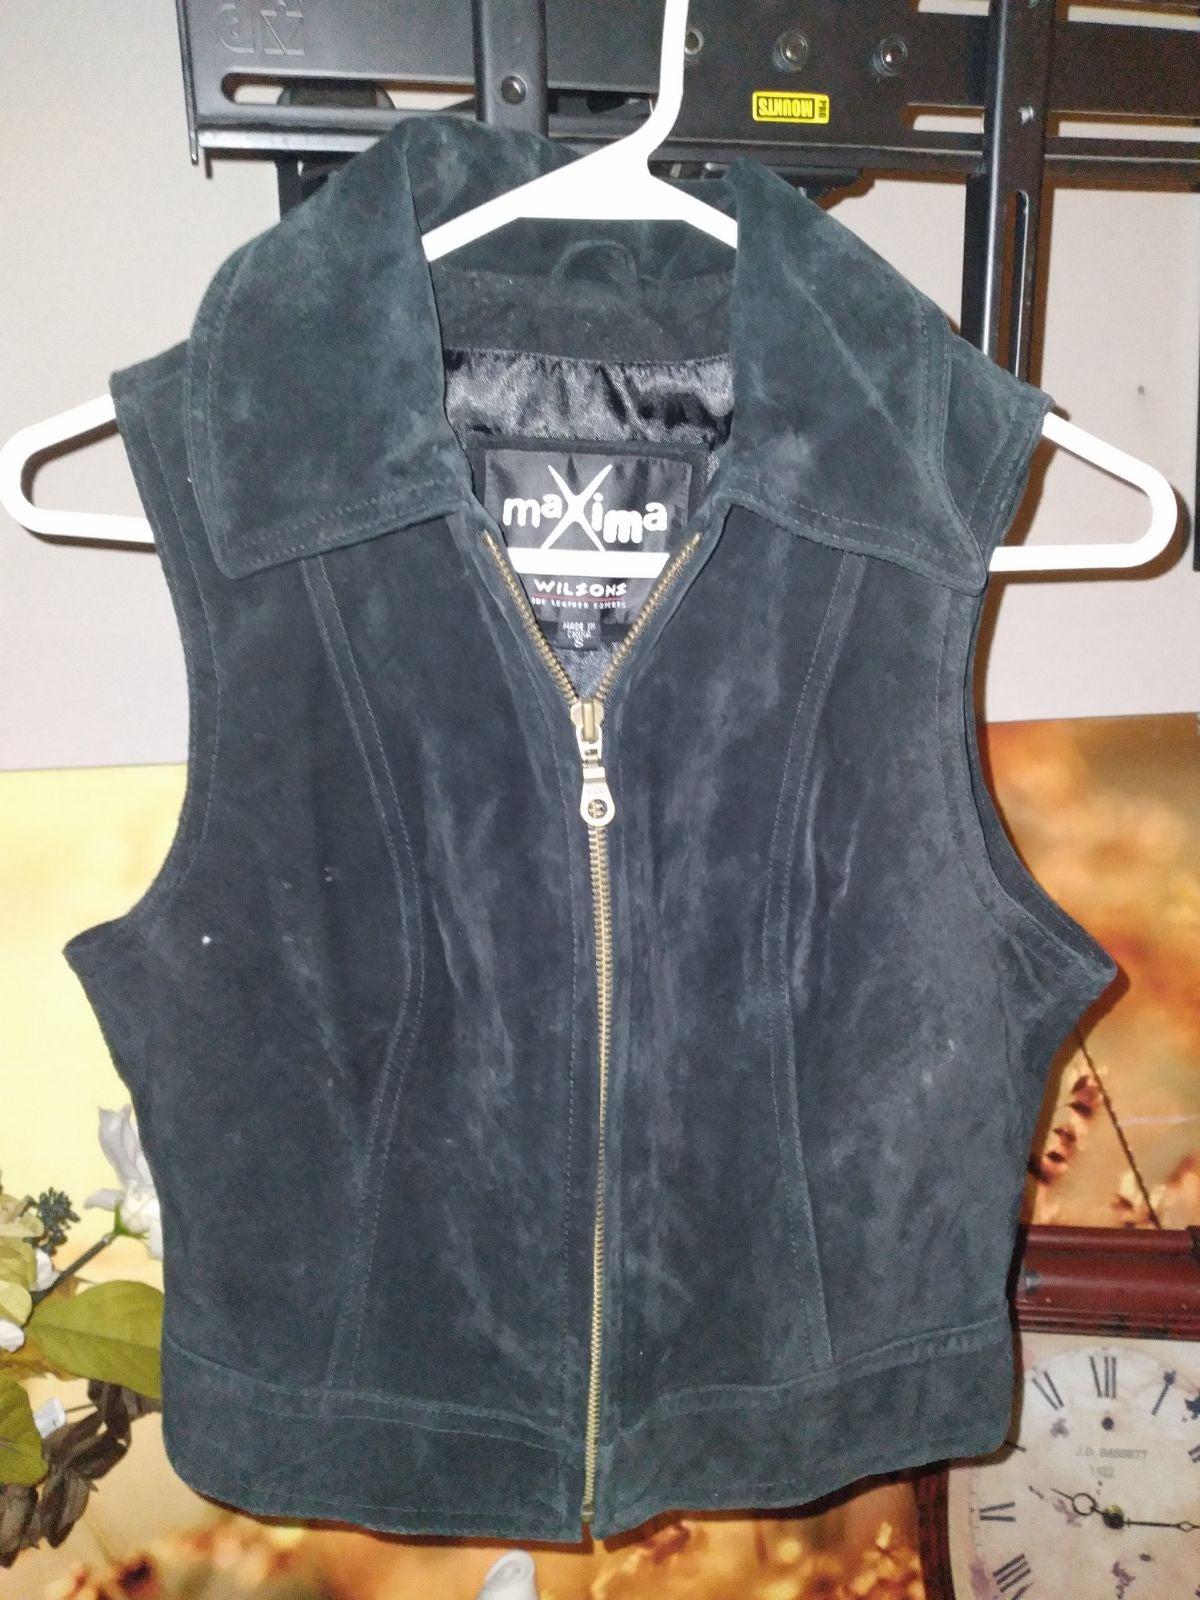 Wilson's maxima suede vest vintage